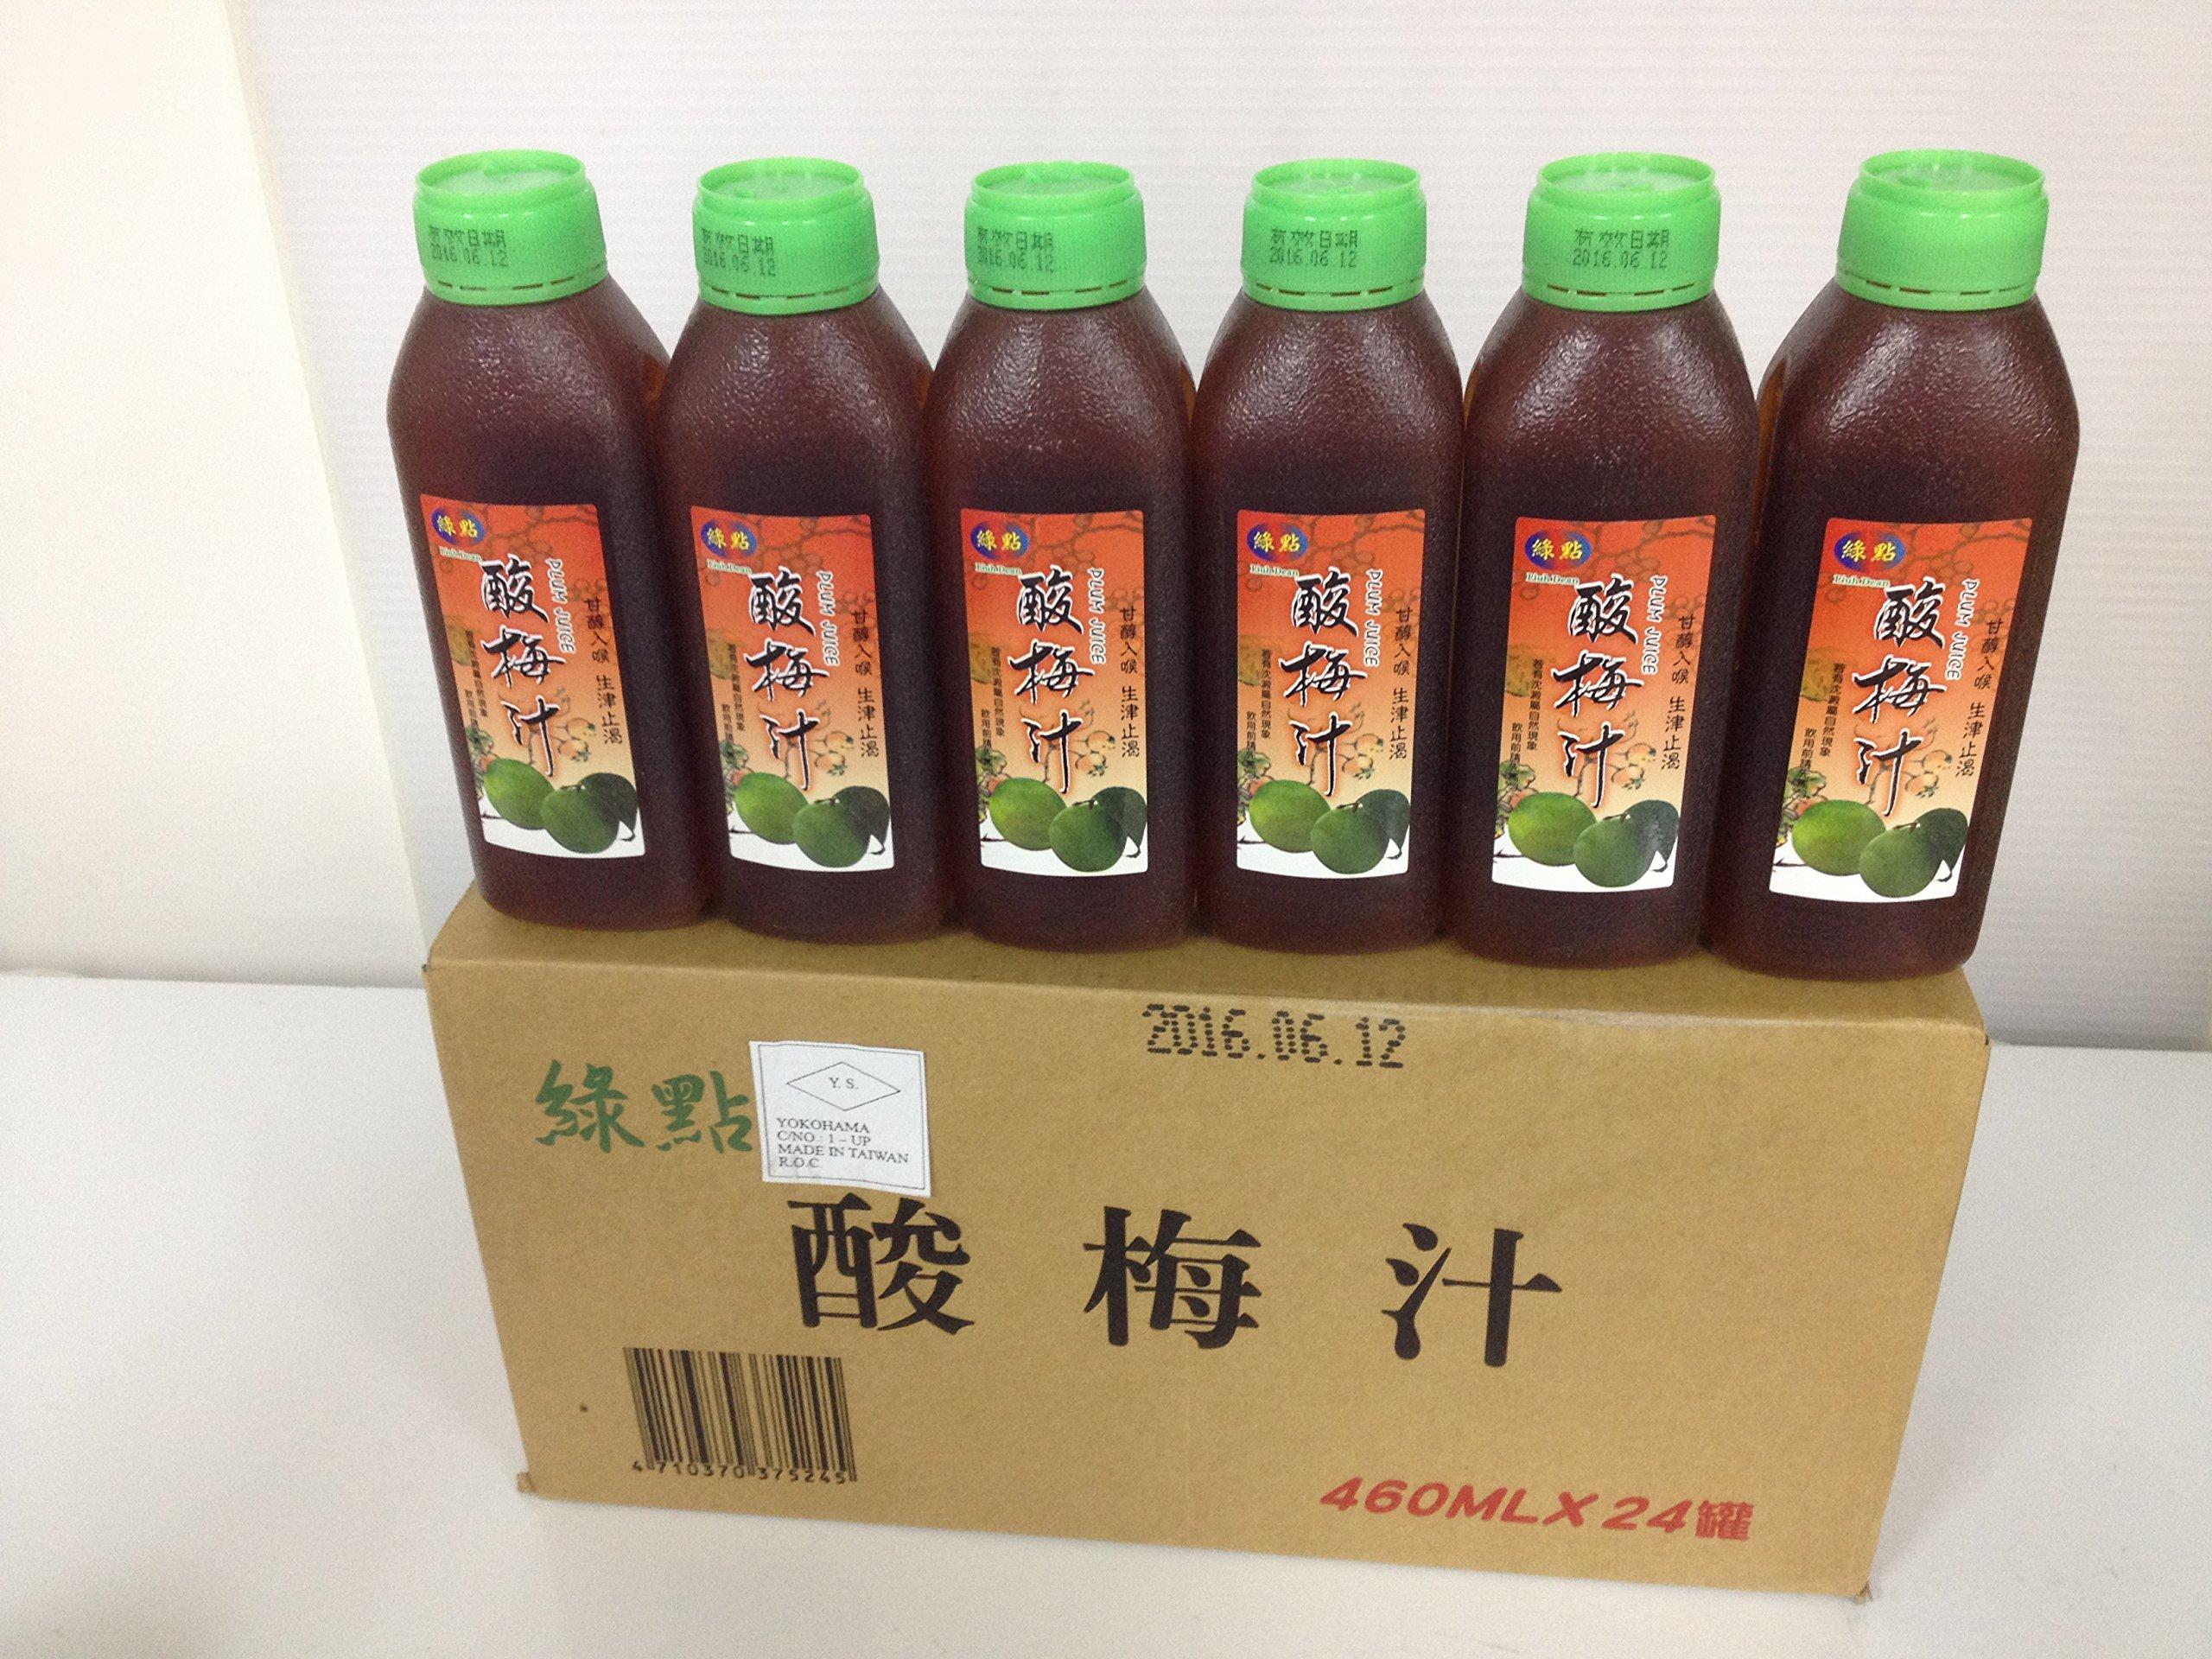 [1 Box Set] green point refreshing San'ume juice-San'umeyu summer fruit juice drink (plum juice, plum juice) Taiwan popular products and summer classic, souvenir 211508